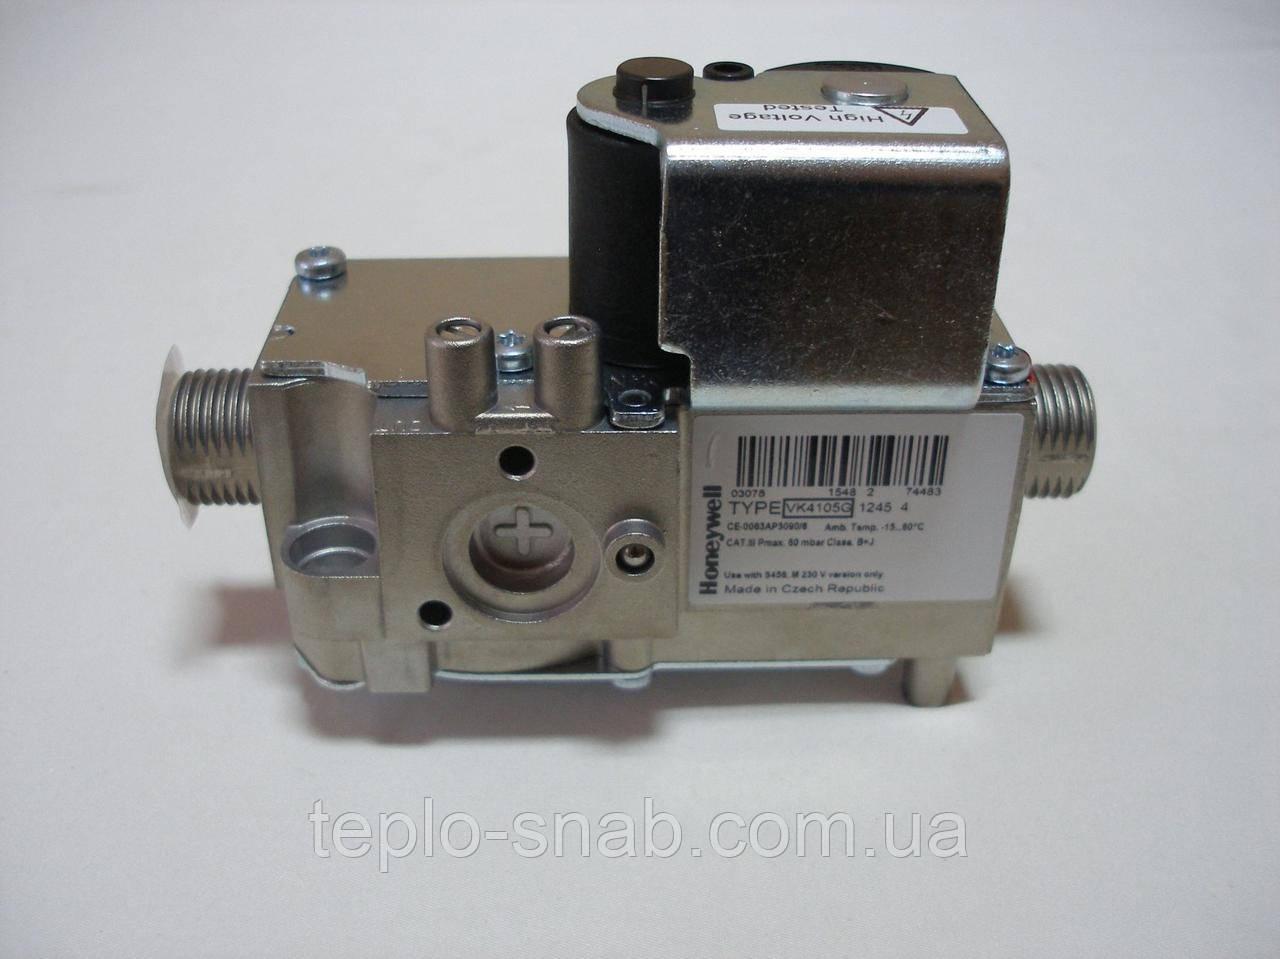 Газовый клапан Honeywell.VK 4105G Ferroli Domiproject,C24,F24,C32,F32 FerEasy C24,F24,C32,F32 - 39819620